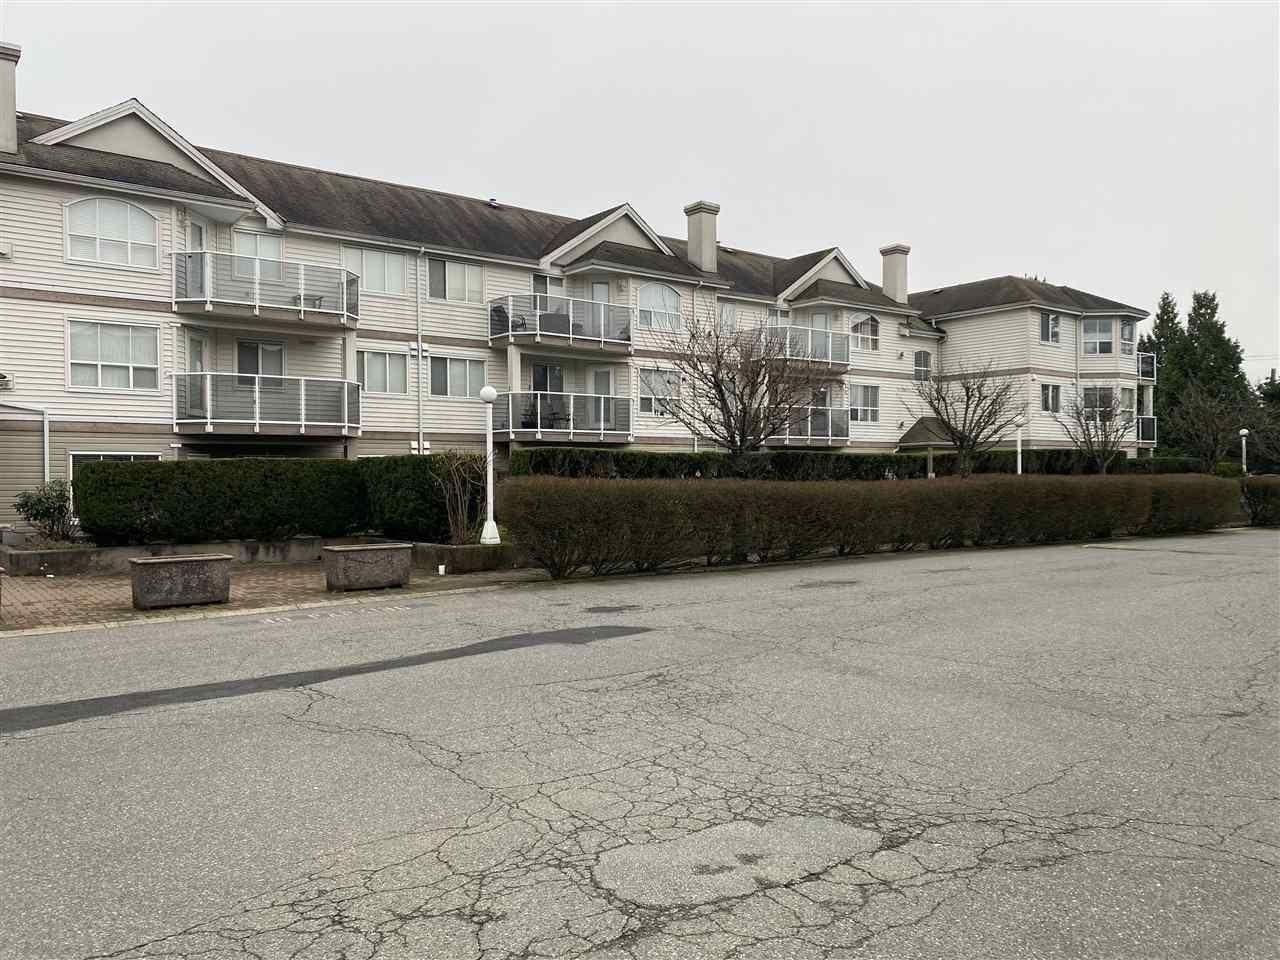 Main Photo: 207 12769 72 Avenue in Surrey: West Newton Condo for sale : MLS®# R2614485